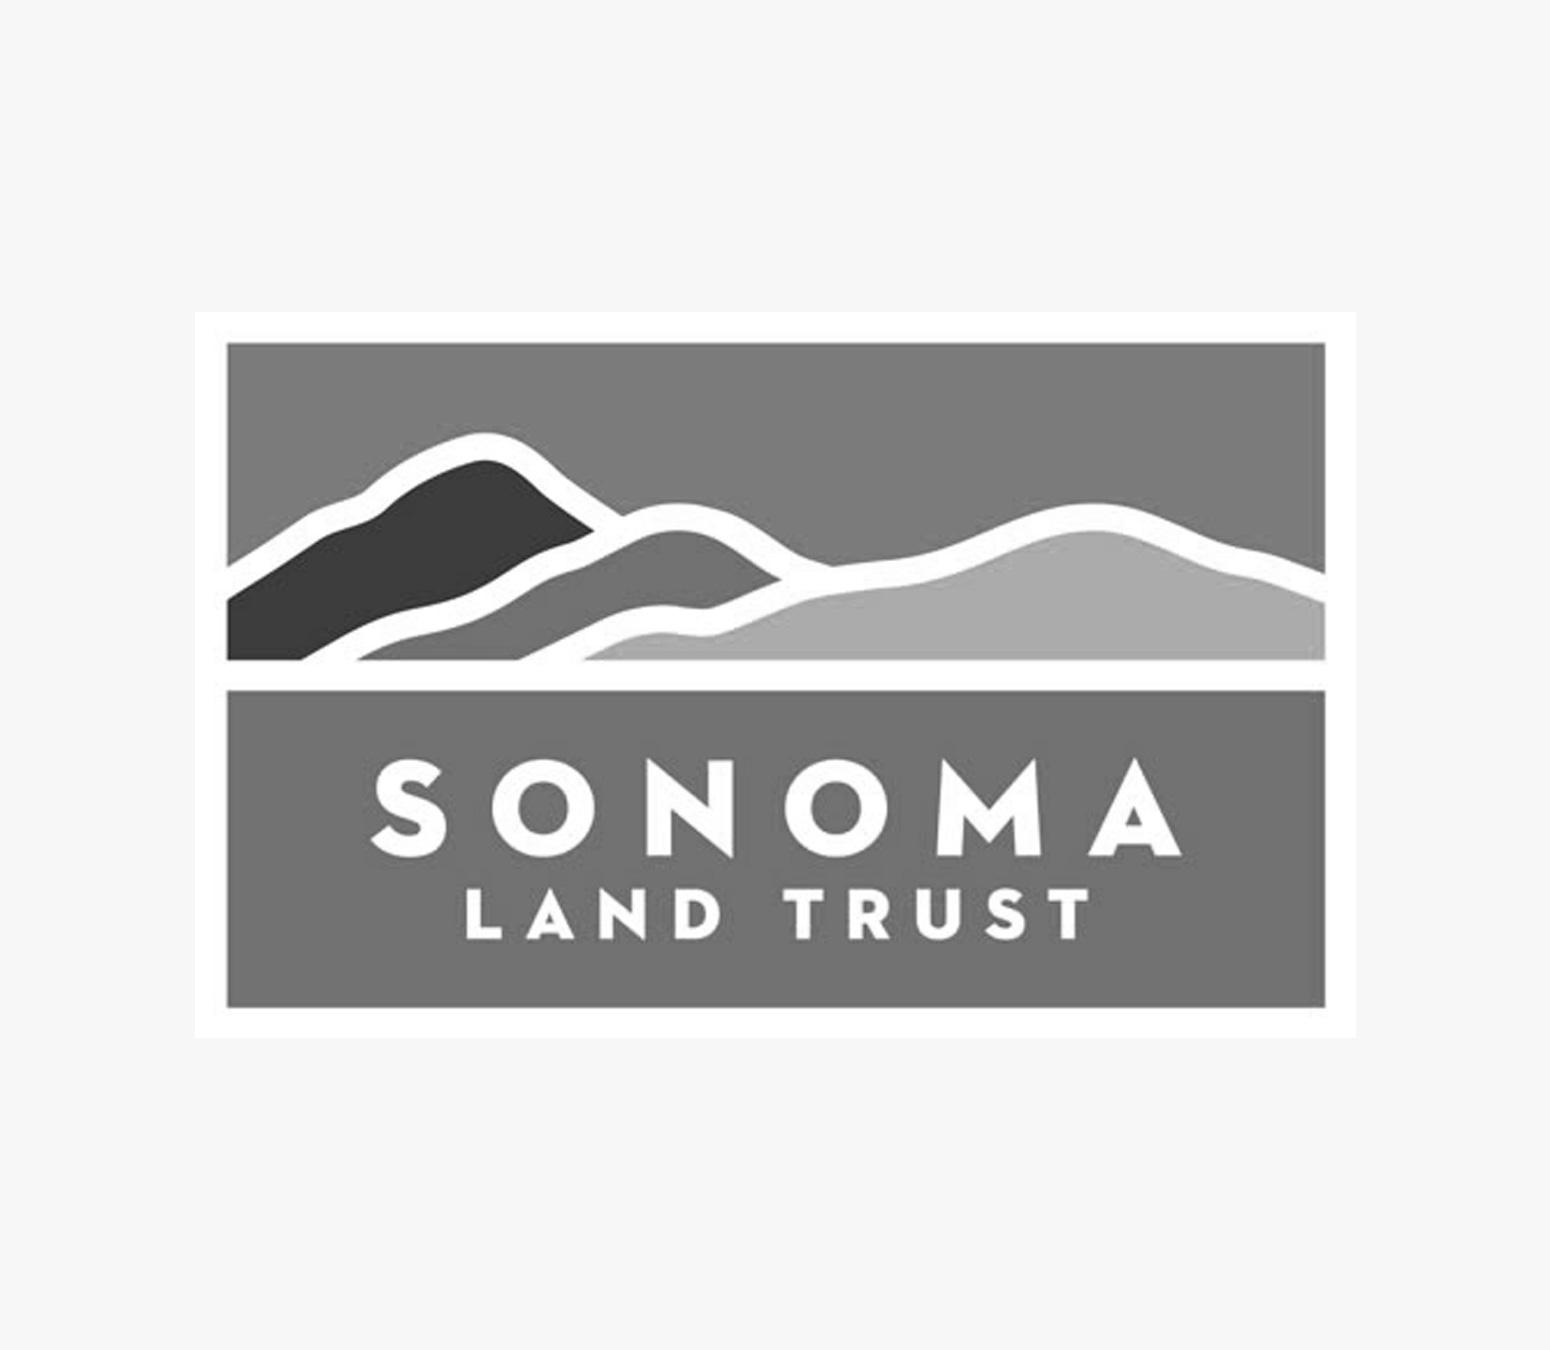 logo-sonoma-land-trust.jpg